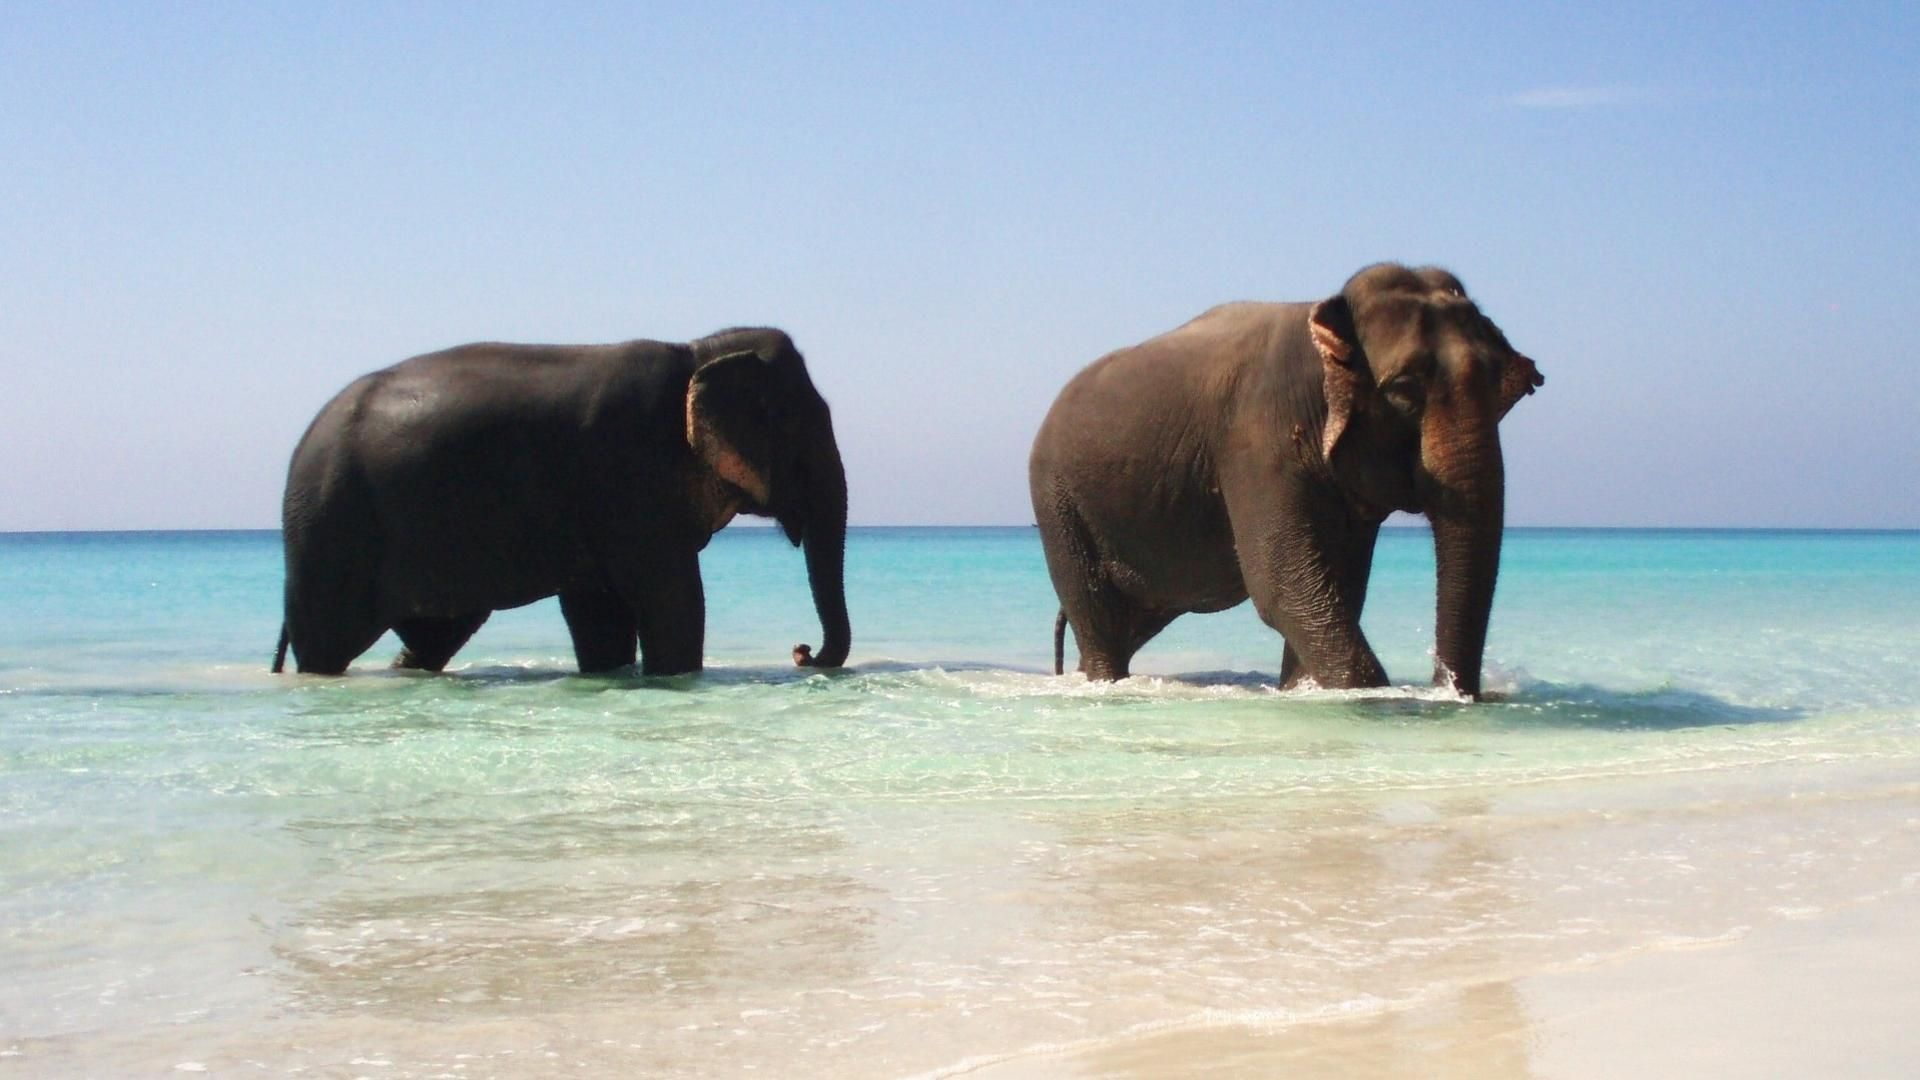 Sri Lanka Sea Elephant